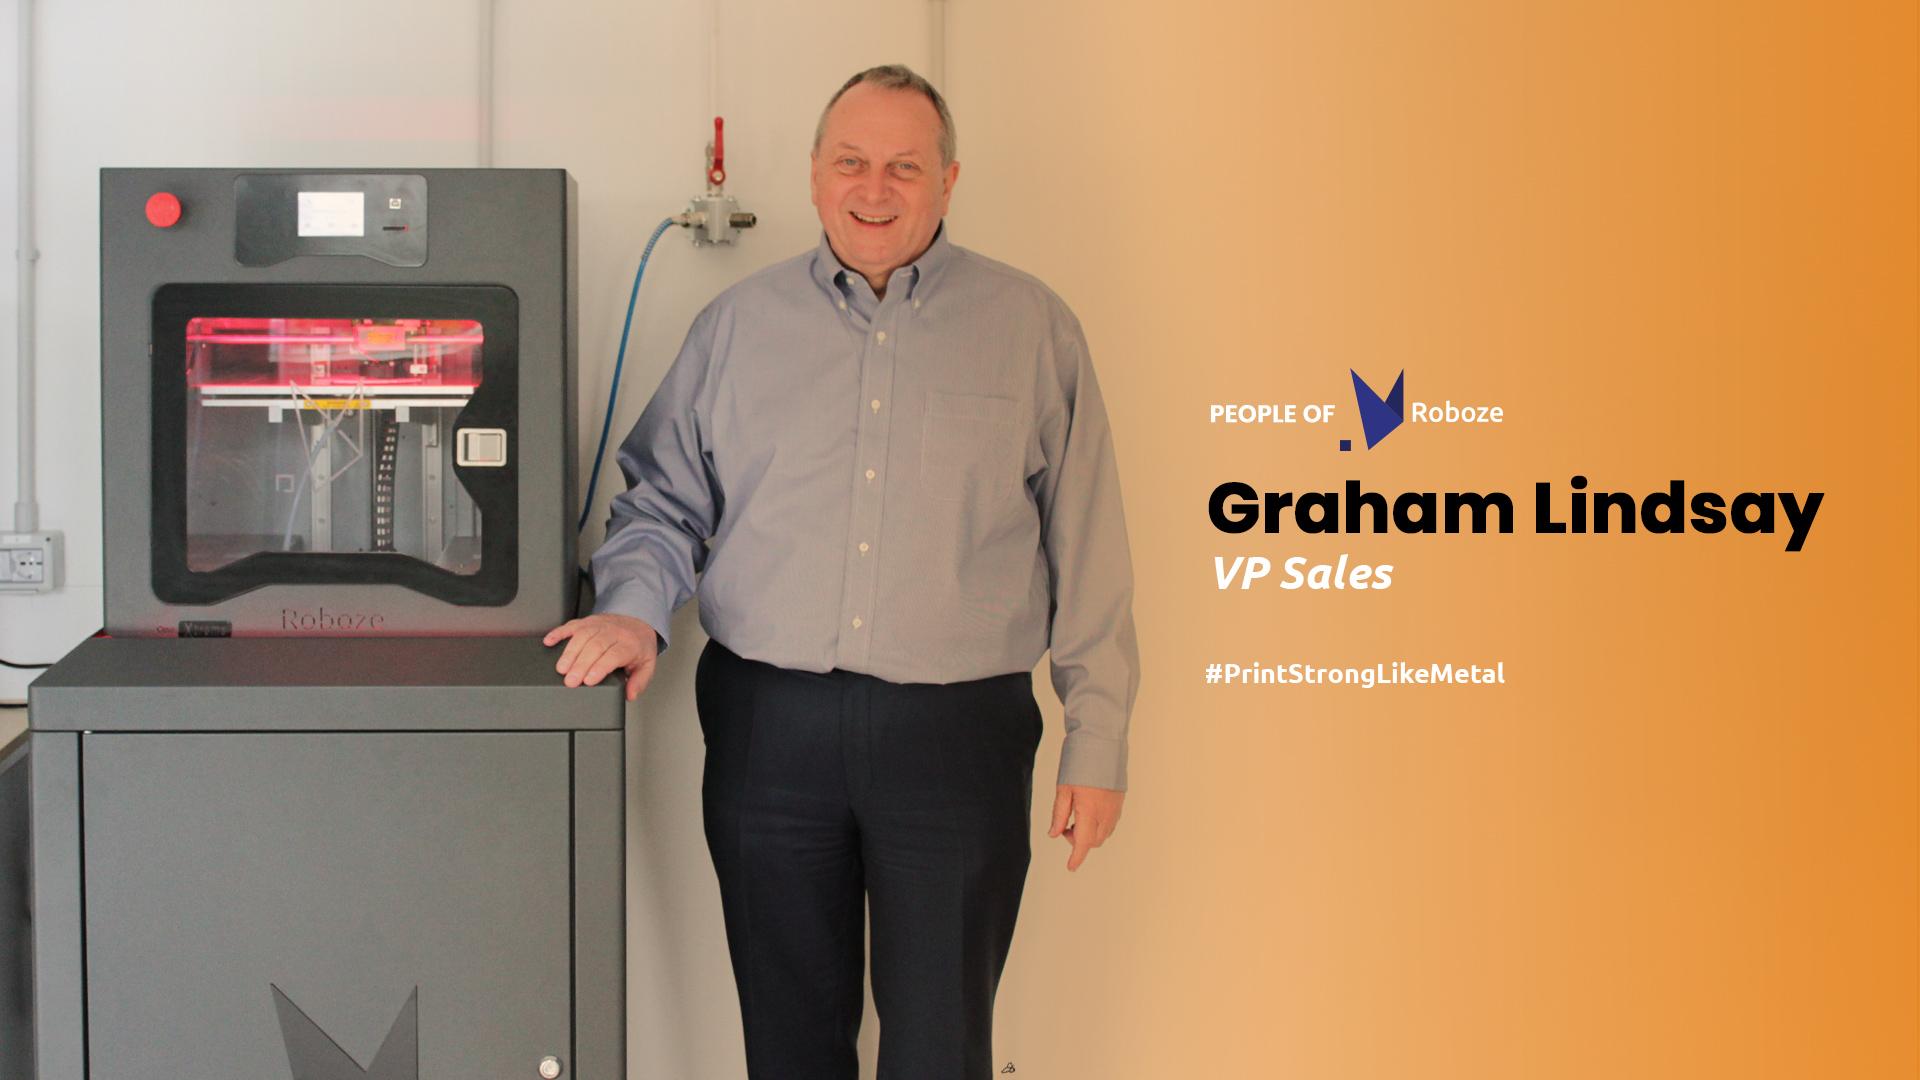 Graham Lindsay, the new Vice President of Sales of Roboze. Image via Roboze.